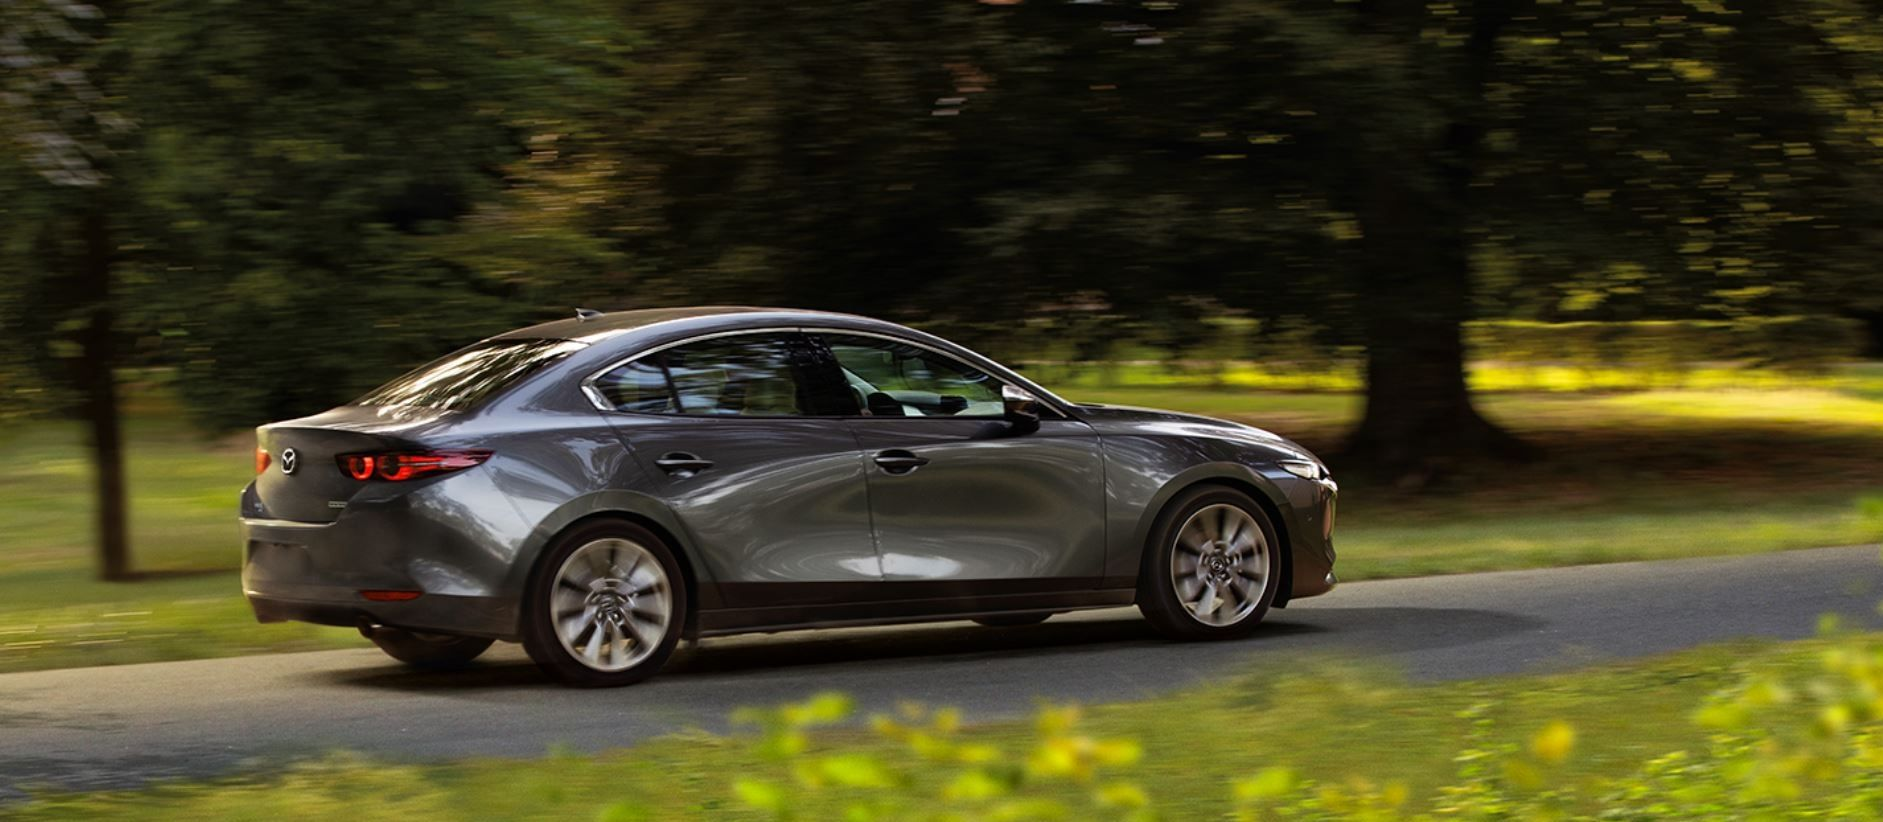 2019 Mazda3 Sedan for Sale near Anaheim, CA